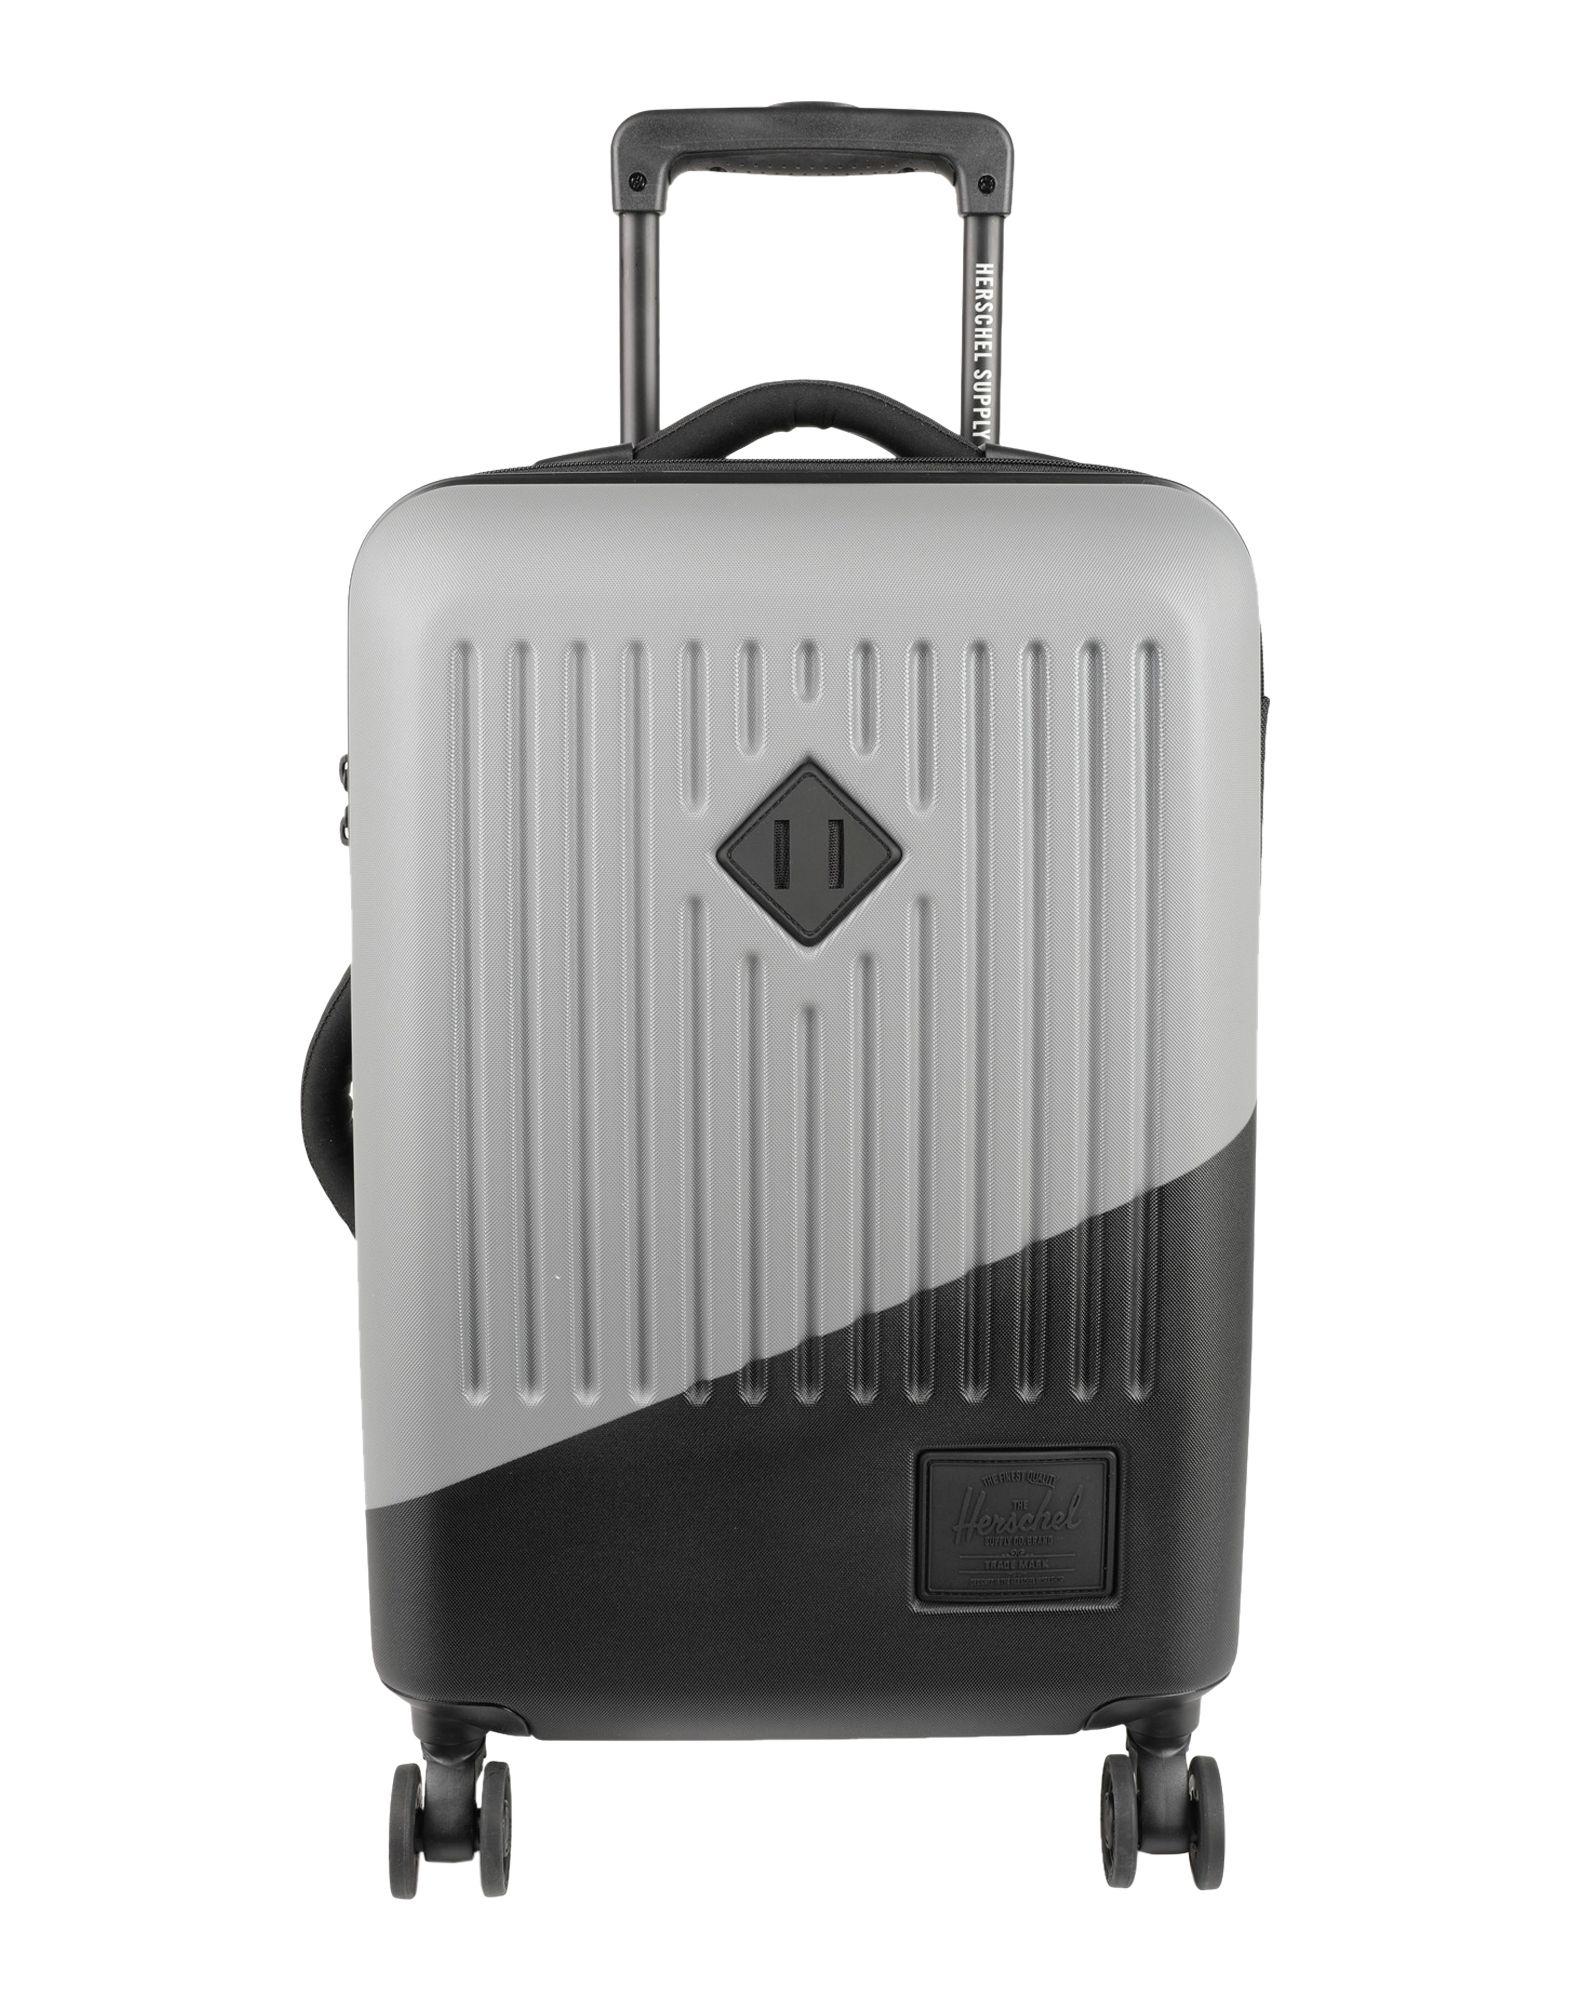 HERSCHEL SUPPLY CO. Чемодан/сумка на колесиках чемодан на колесиках trunki чемодан на колесиках